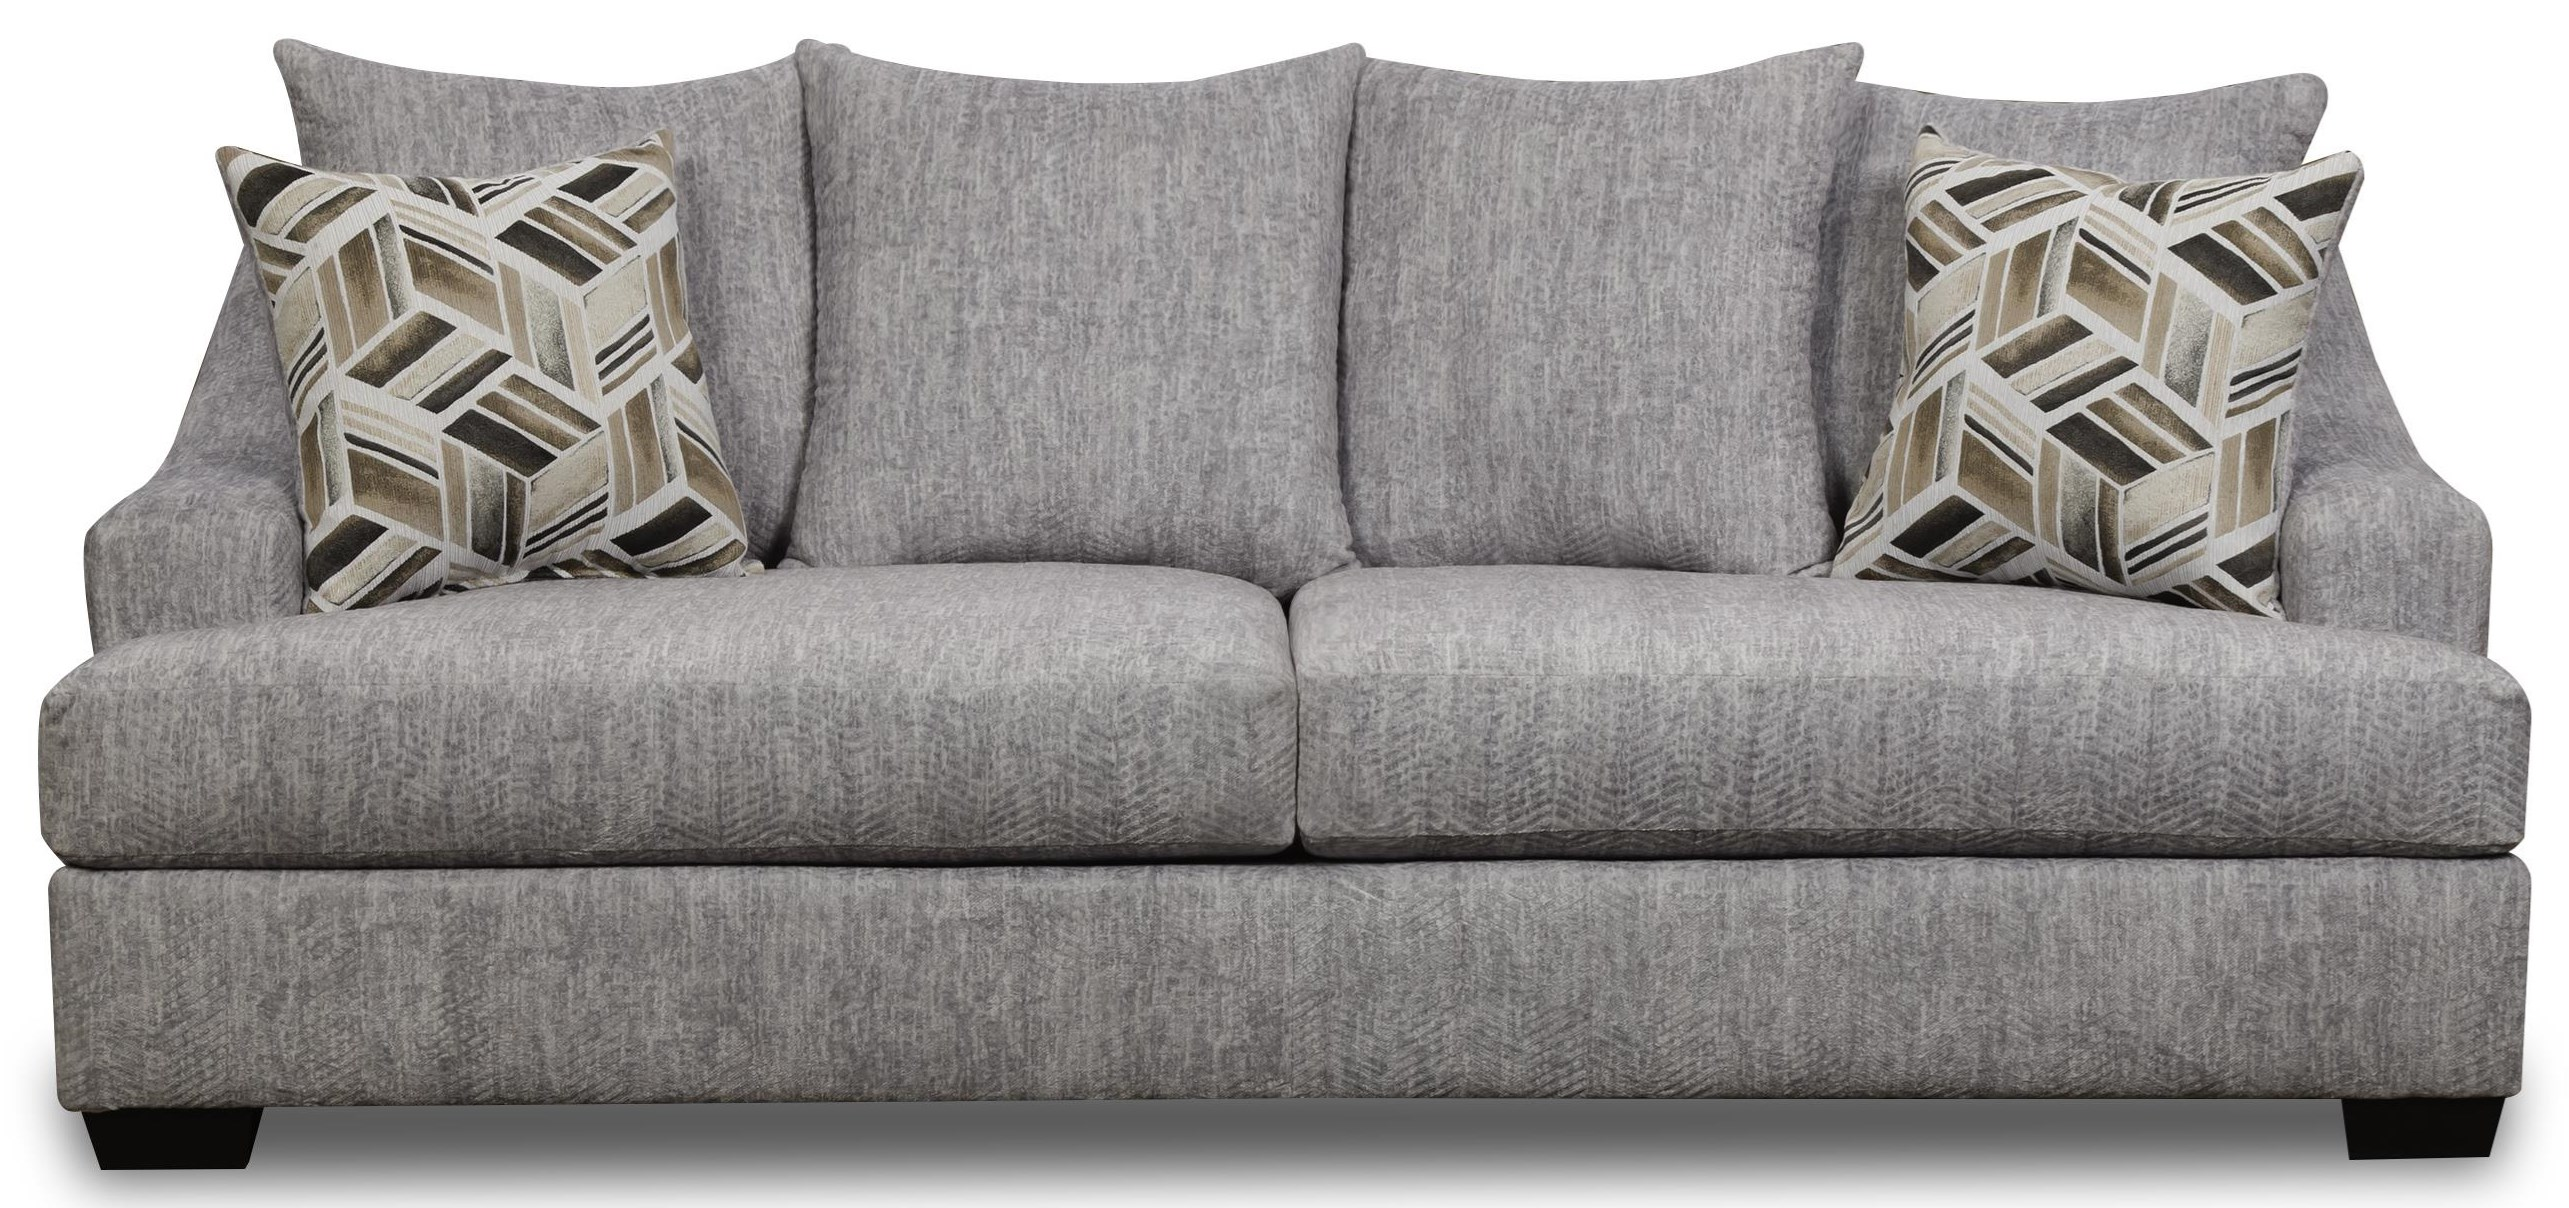 4210 Sofa by Corinthian at VanDrie Home Furnishings